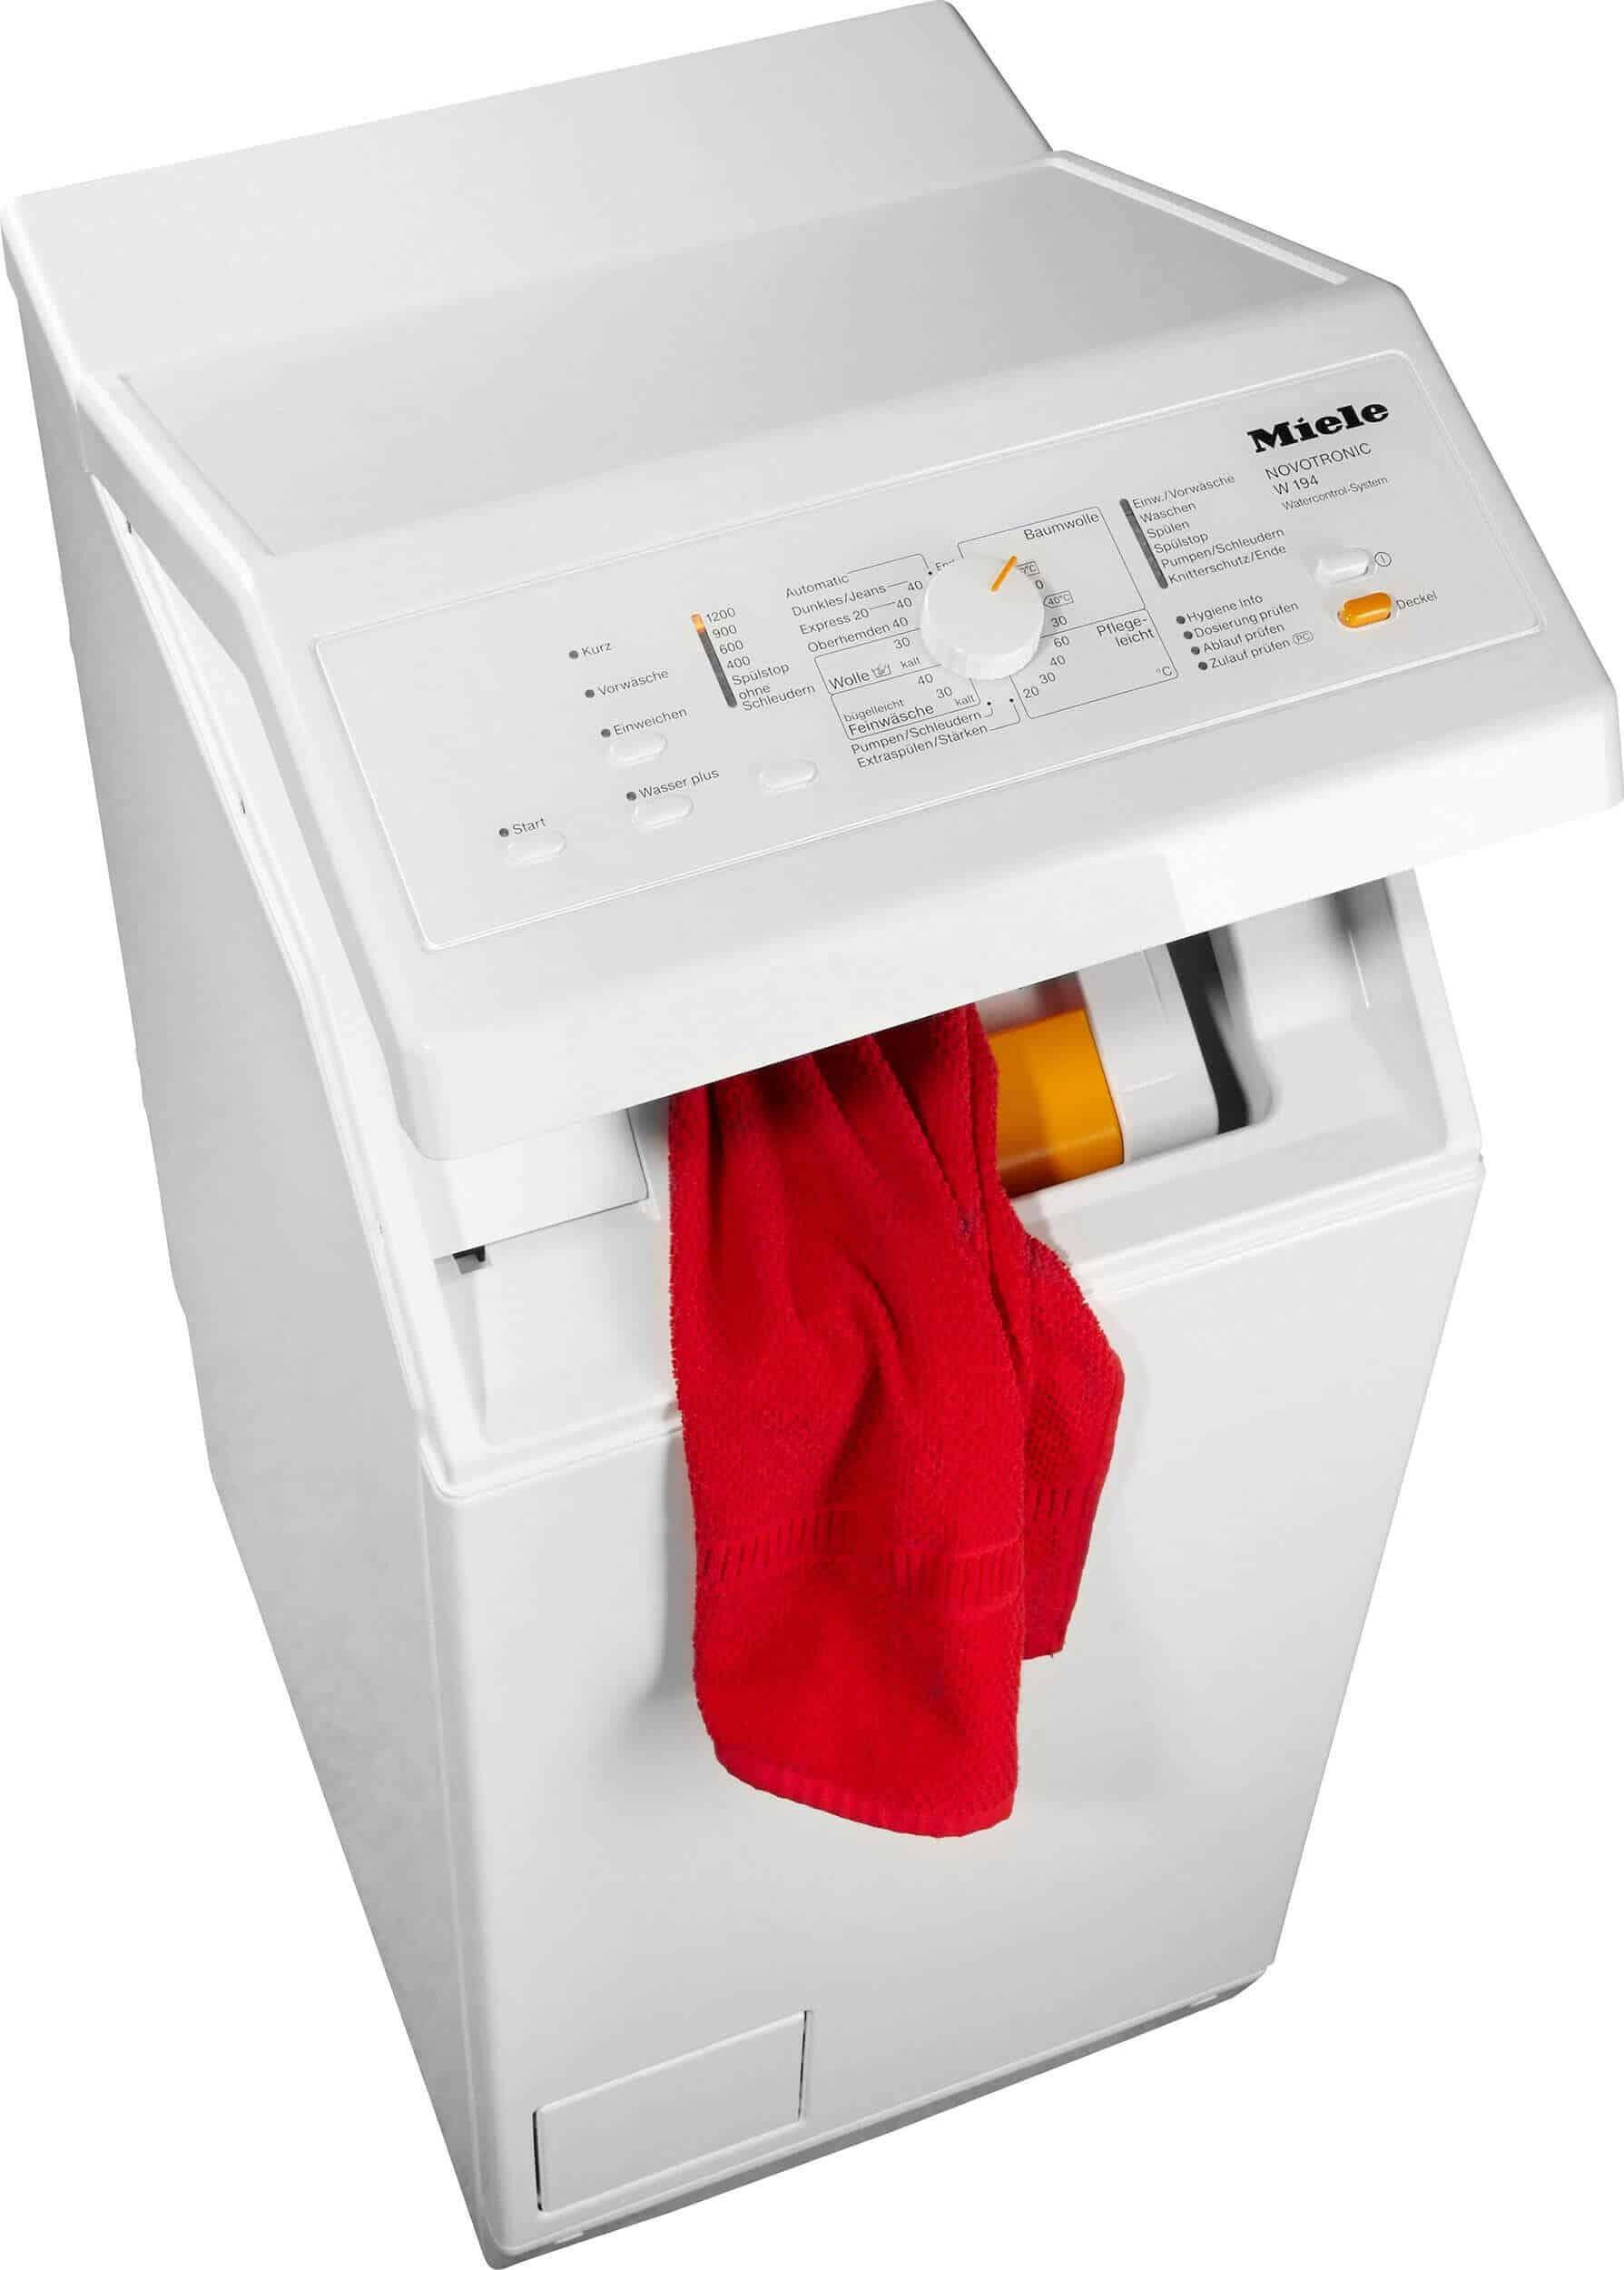 Miele W 194 Wcs Hochwertige Miele Toplader Waschmaschine